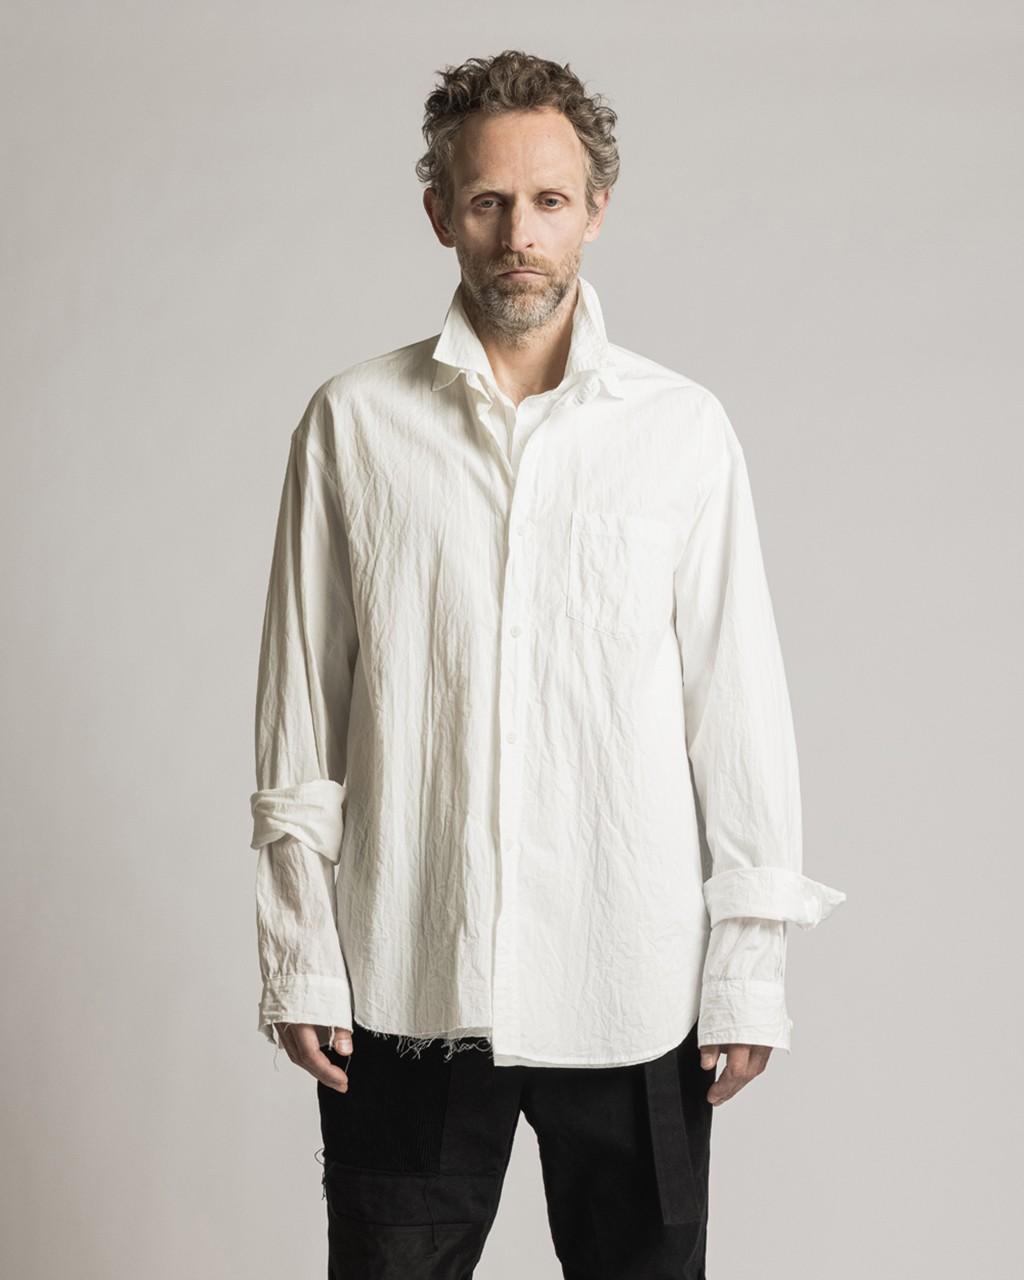 21AW DUE-Ⅲ-031-SHT-WHT Dual Shirt